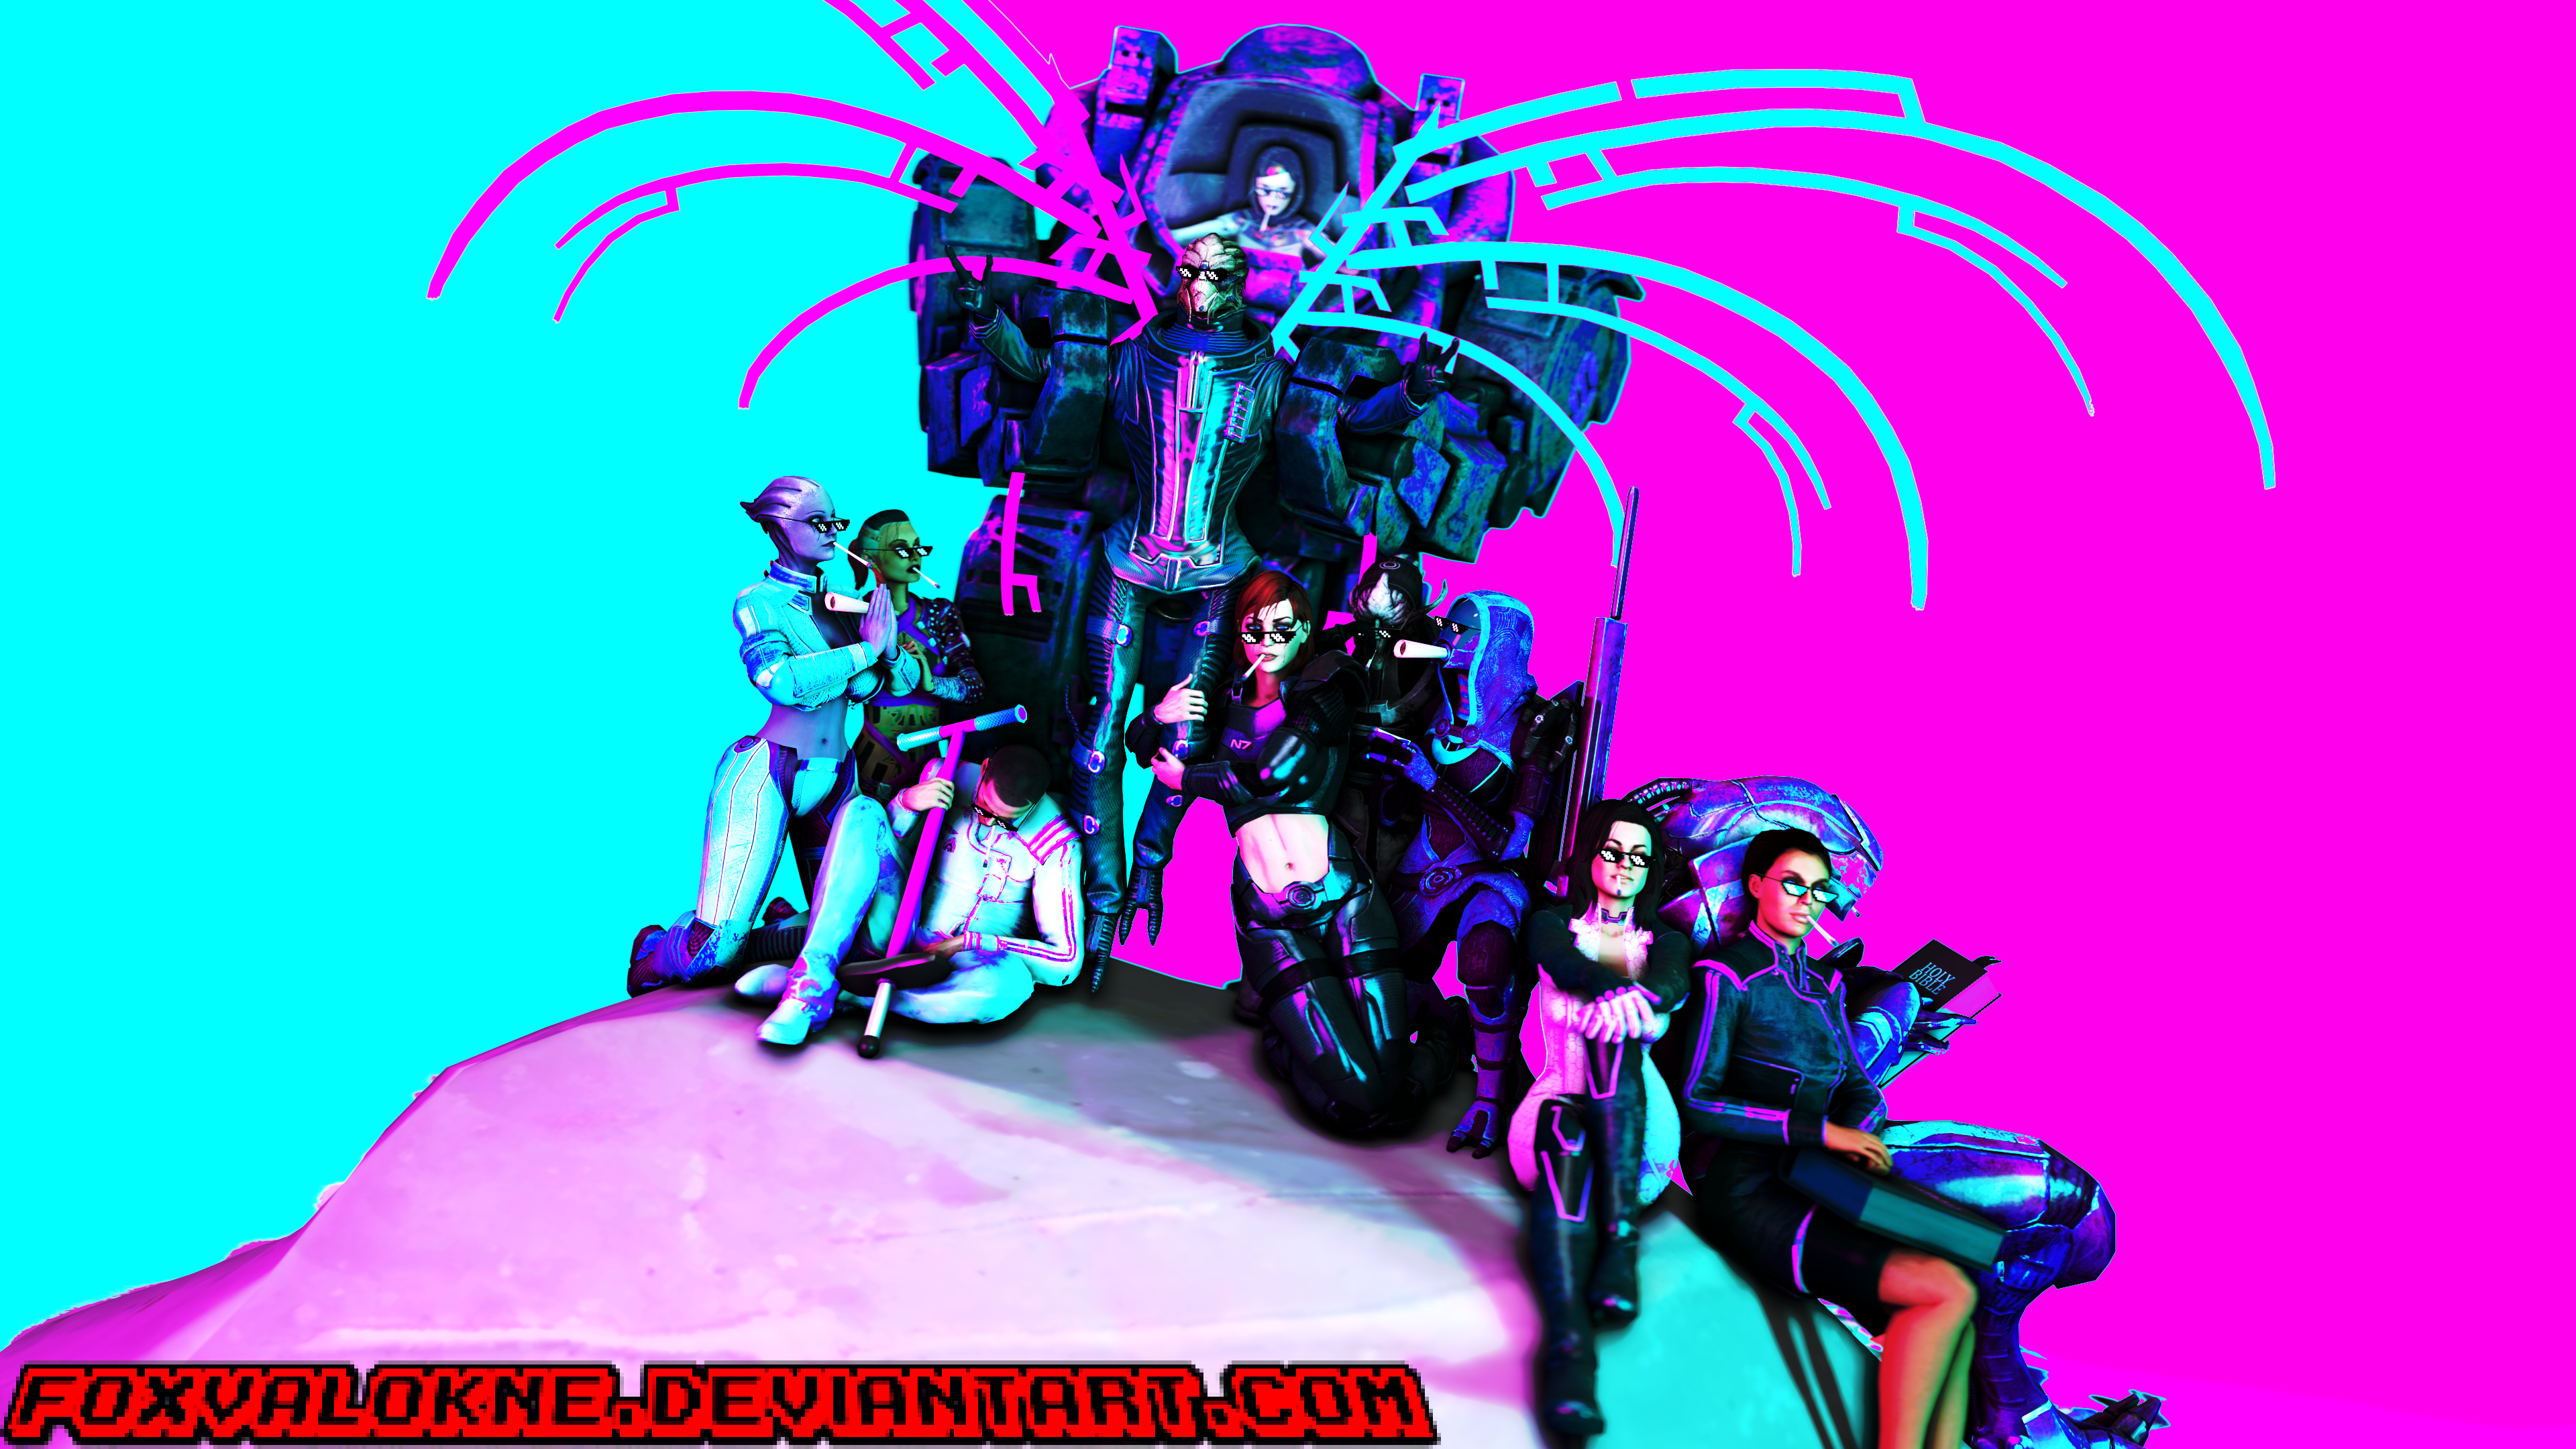 -=-=-= SFM_Wallpaper_Request_ 005 =-=-=- by FoxValoKne